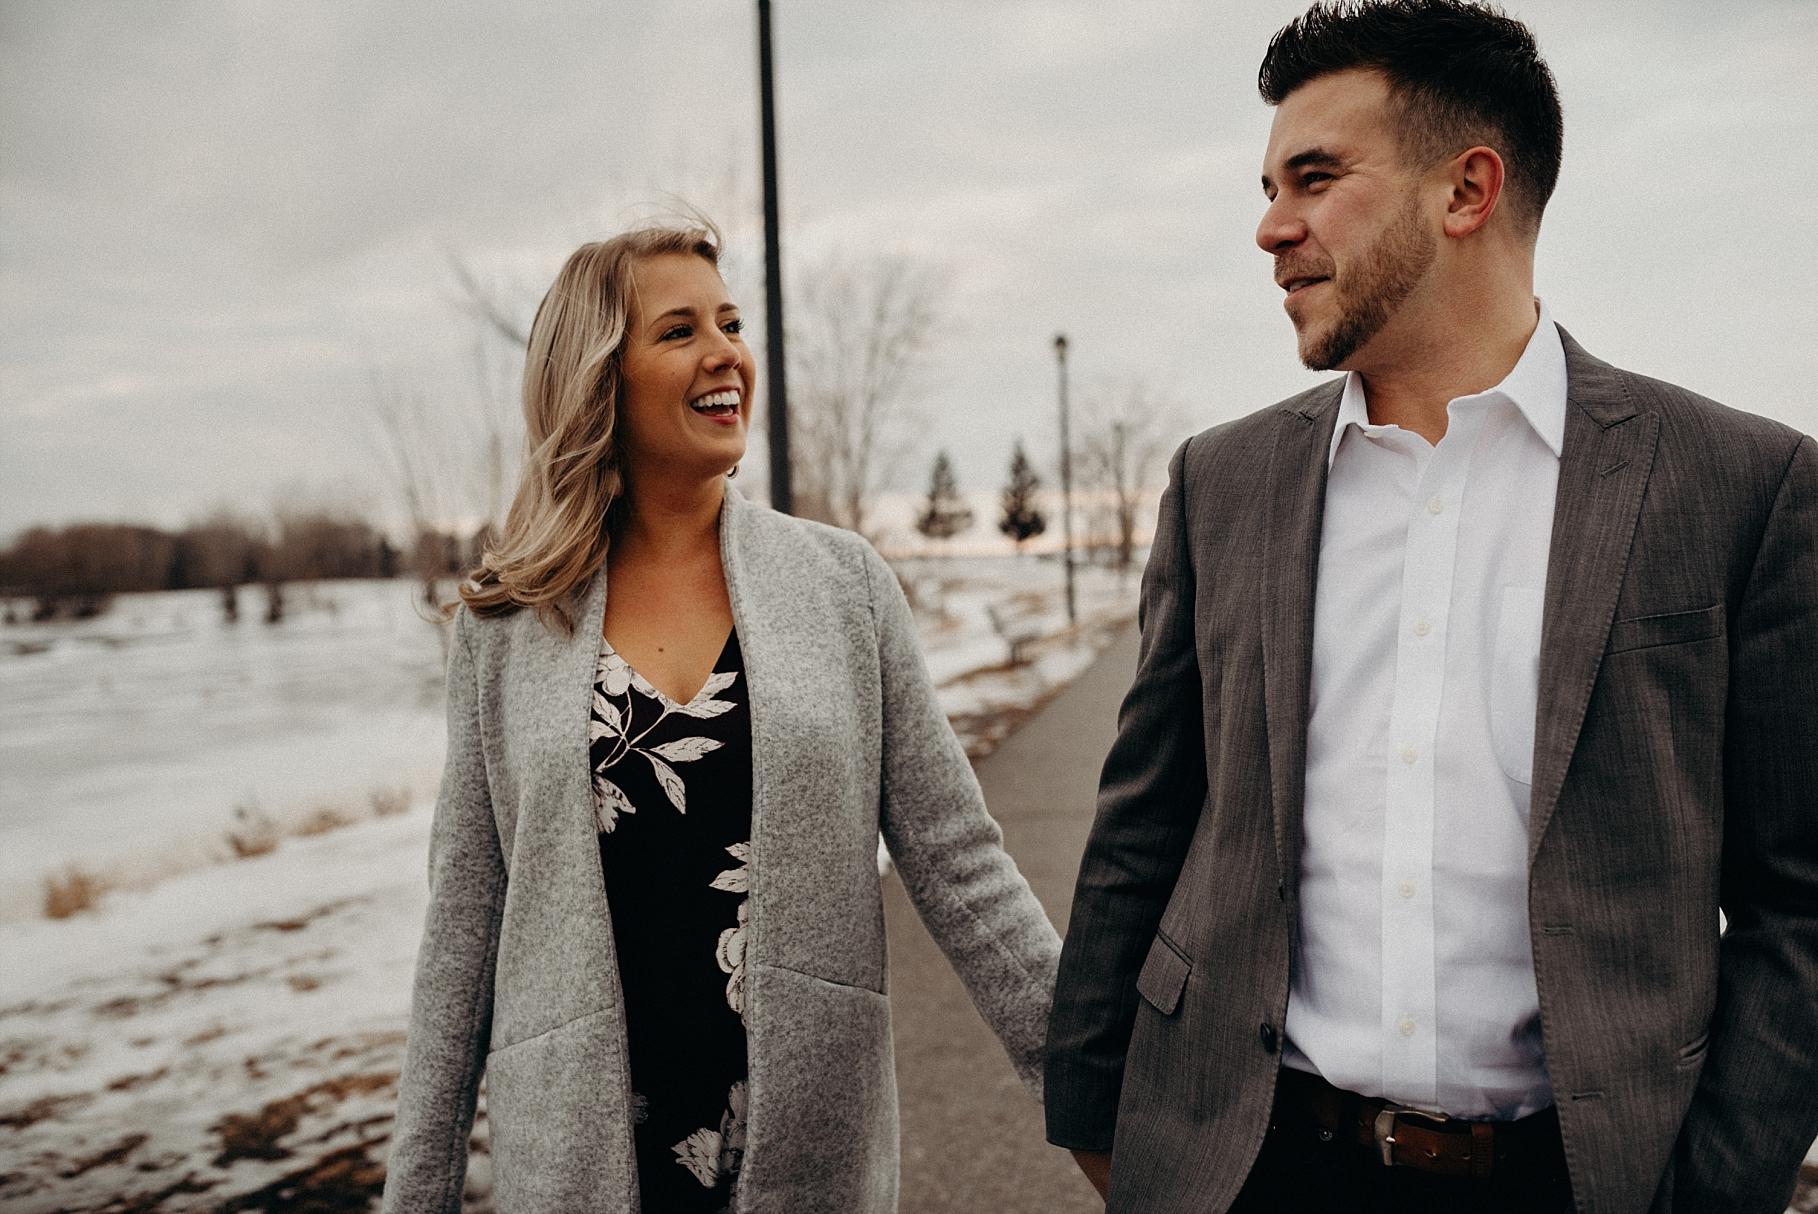 Mocha Tree Studios Ottawa Toronto Montreal Wedding and Engagement Photographer and Videographer Dark Moody Intimate Authentic Modern Romantic Cinematic Best Candid Nepean Sailing Club Andew Haydon Park 3